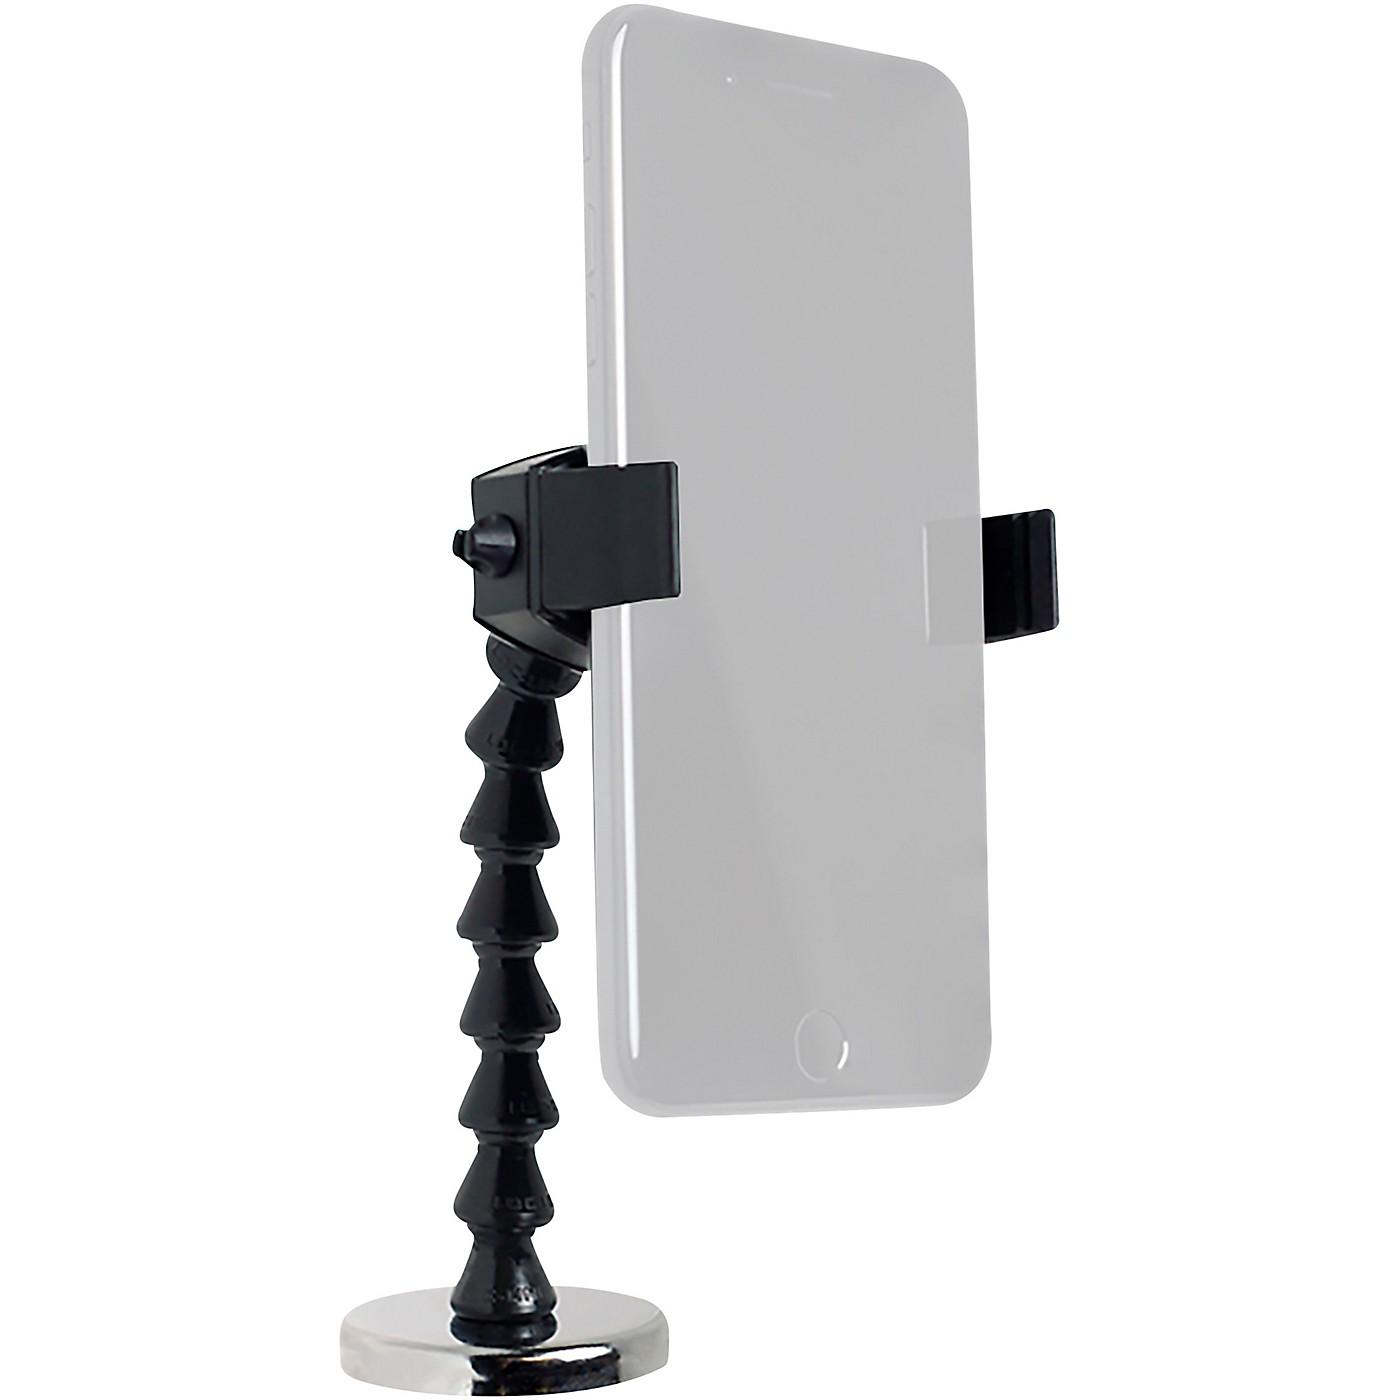 Stage Ninja FON-9-MB Phone Mount With Magnetic Base thumbnail